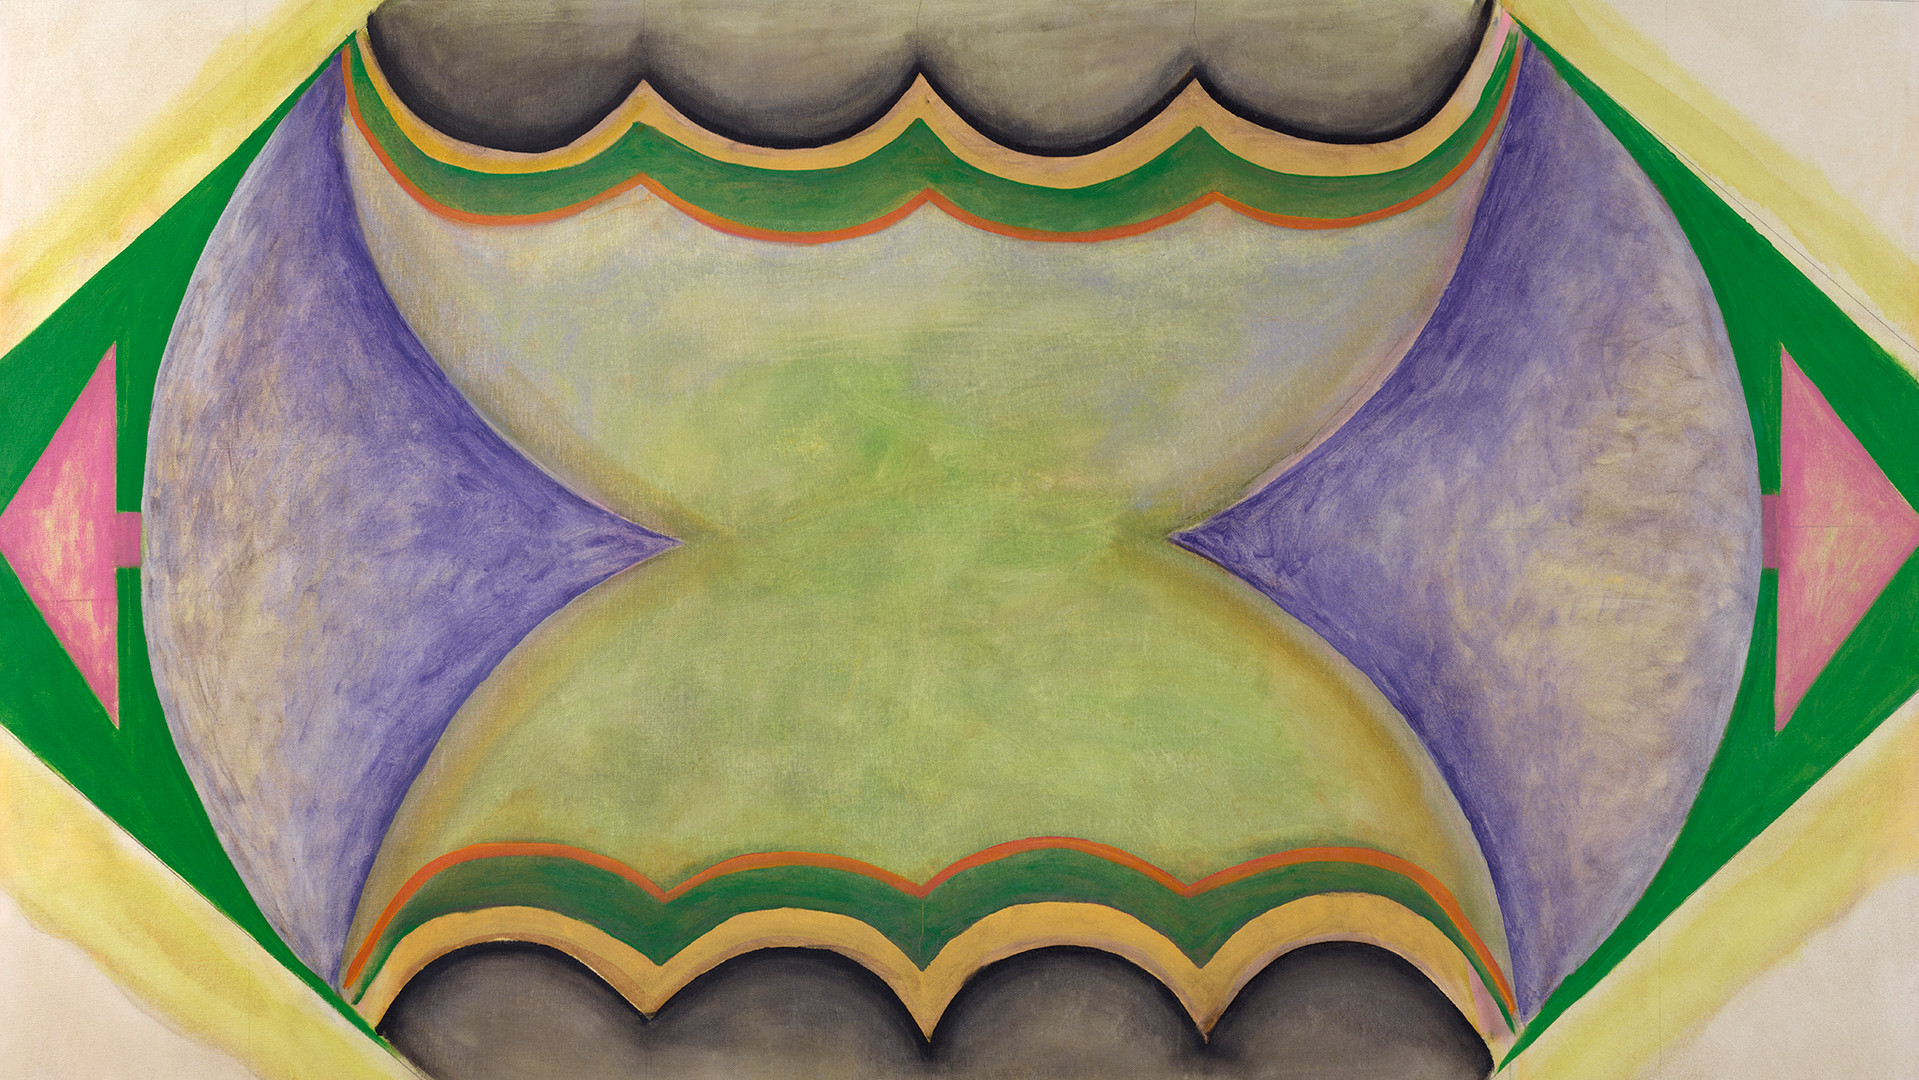 Ida Kohlmeyer (1912-1997) Suspended, 1968  Mixed media on canvas 57 1/4 x 69 in. (145.4 x 175.3 cm) copyright Estate of Ida Kohlmeyer. Courtesy Berry Campbell, New York.